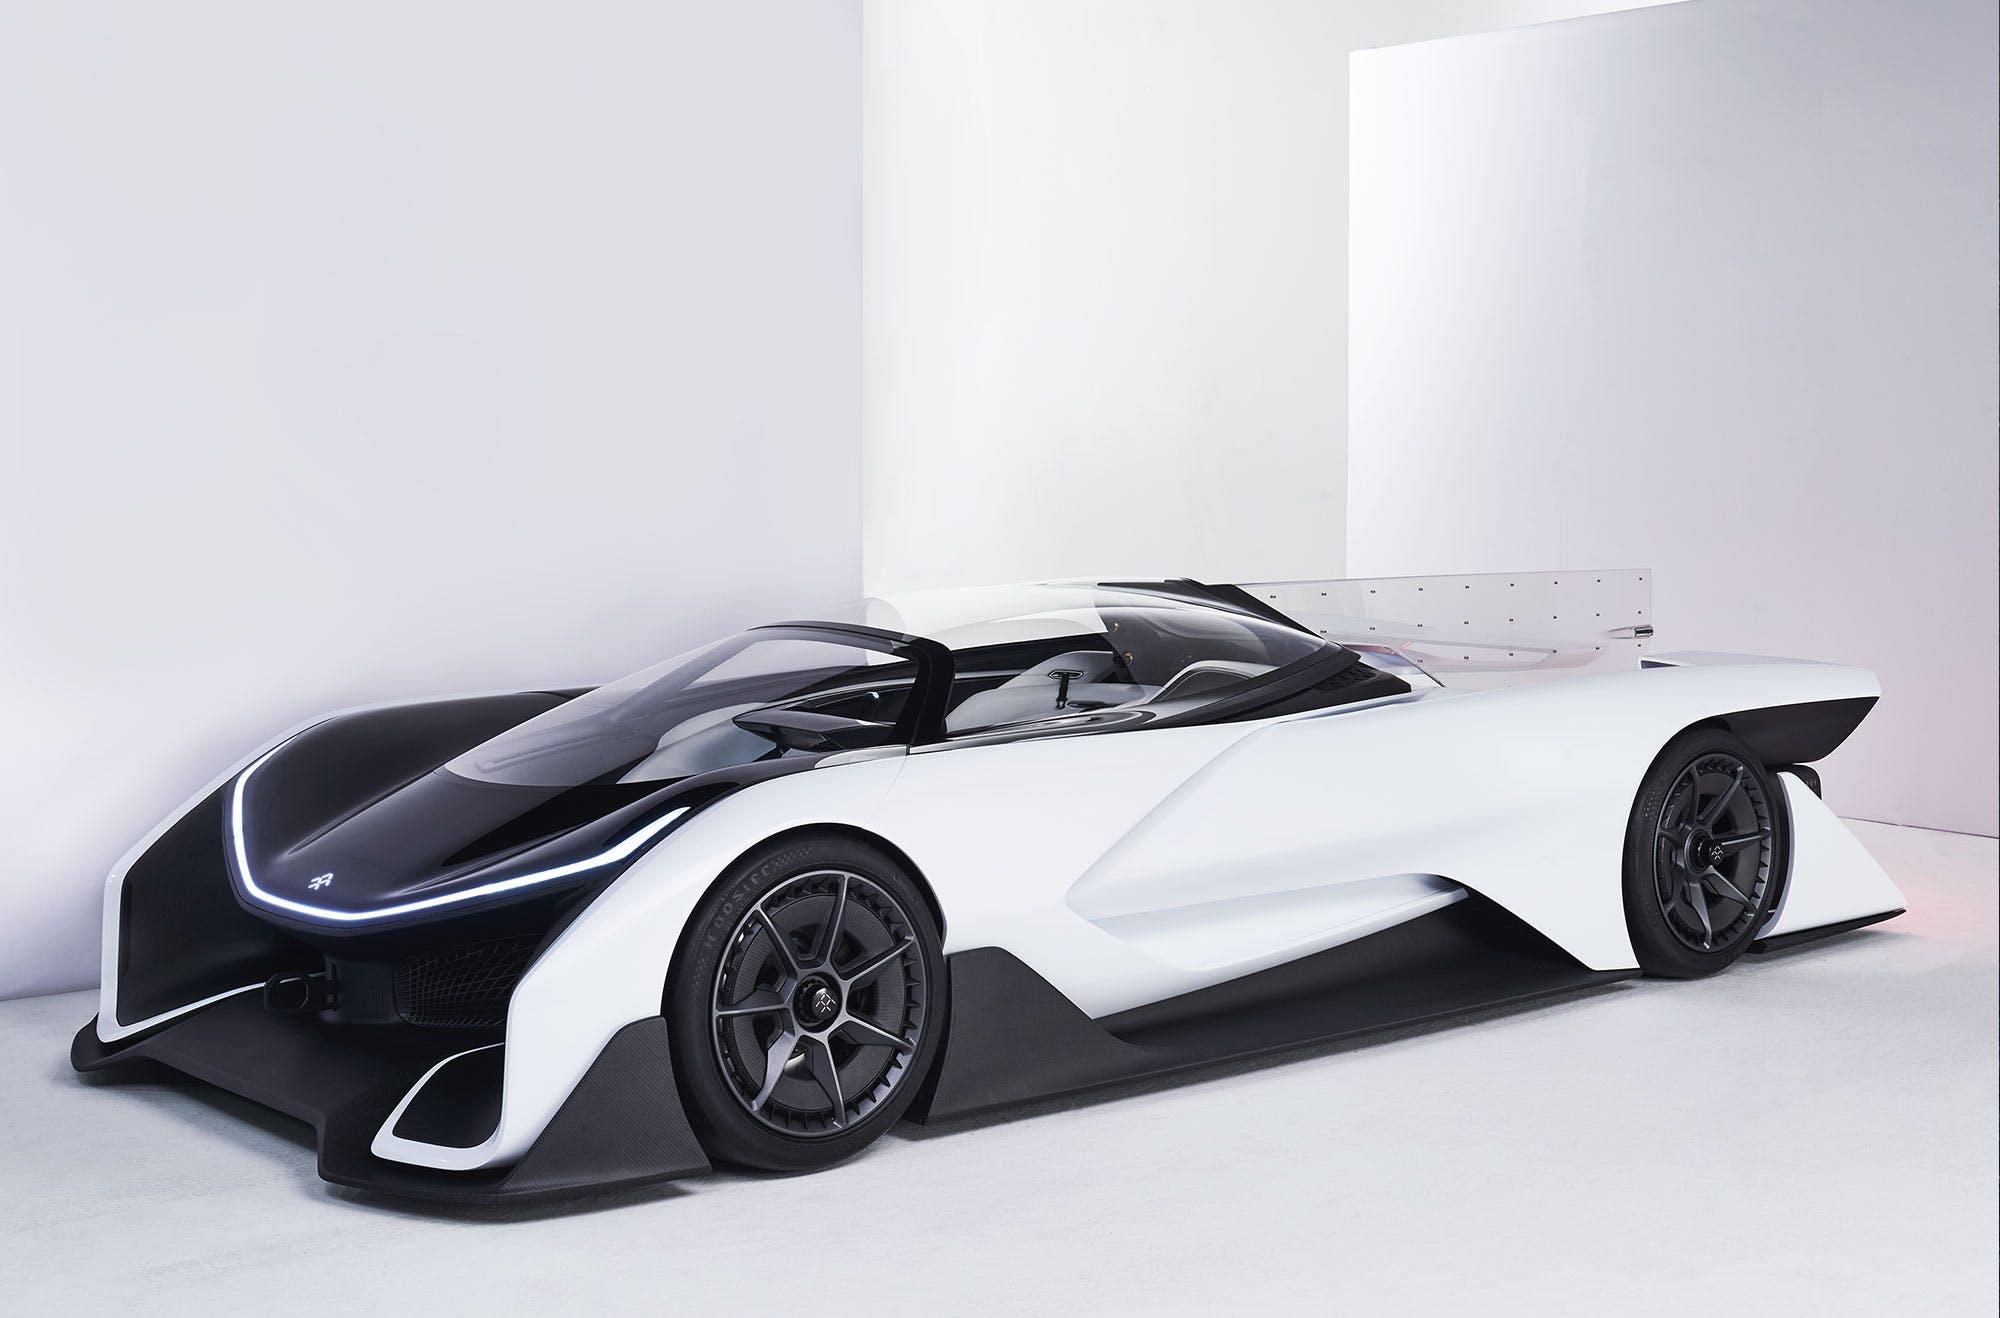 The Ffzero1 Concept Car Credit Faraday Future